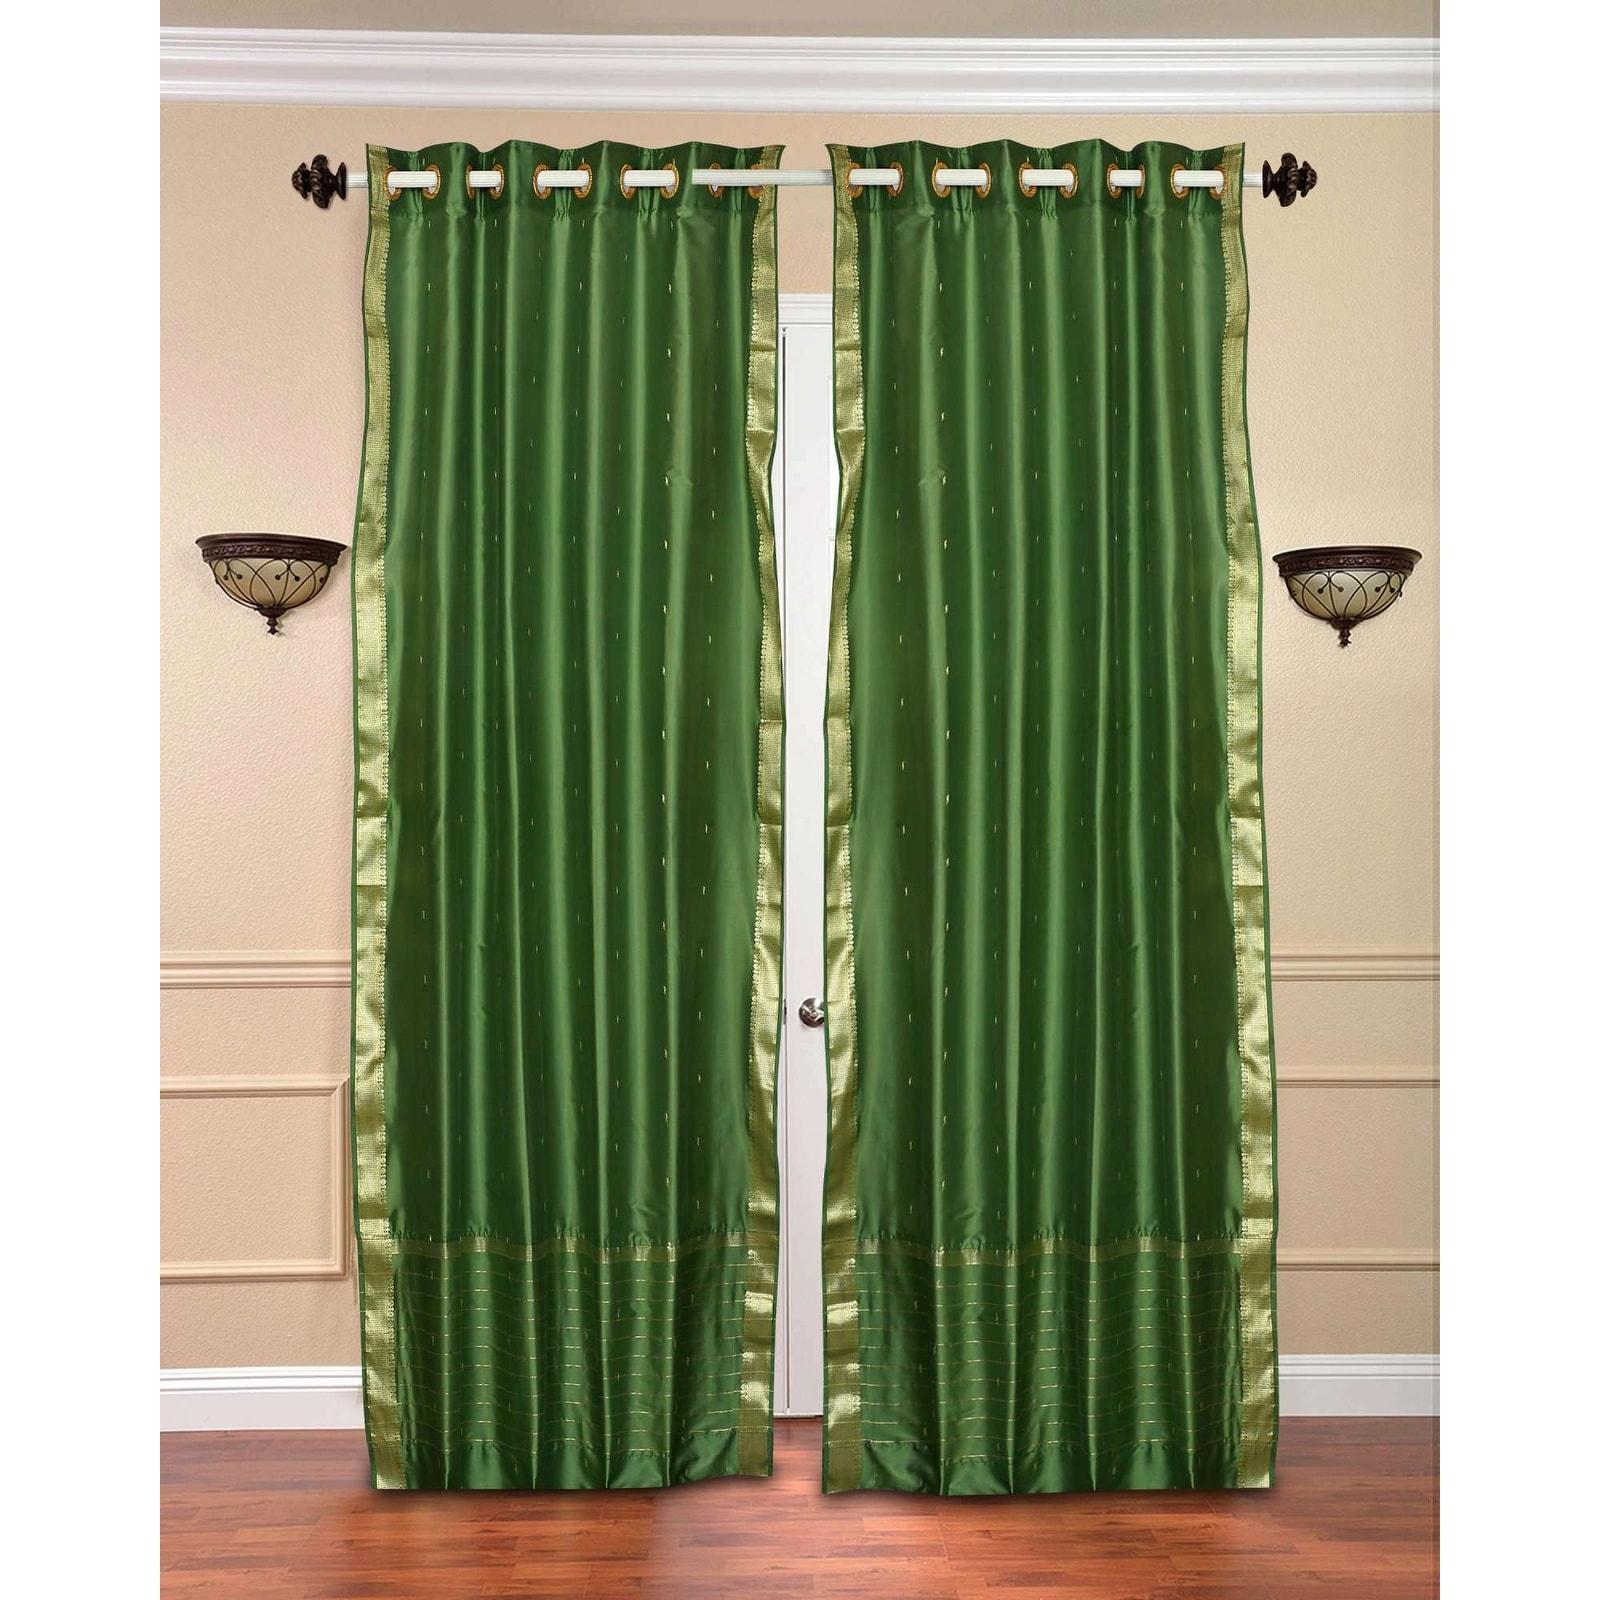 Forest Green Ring Top Sheer Sari Curtain Drape Panel Piece Overstock 18541362